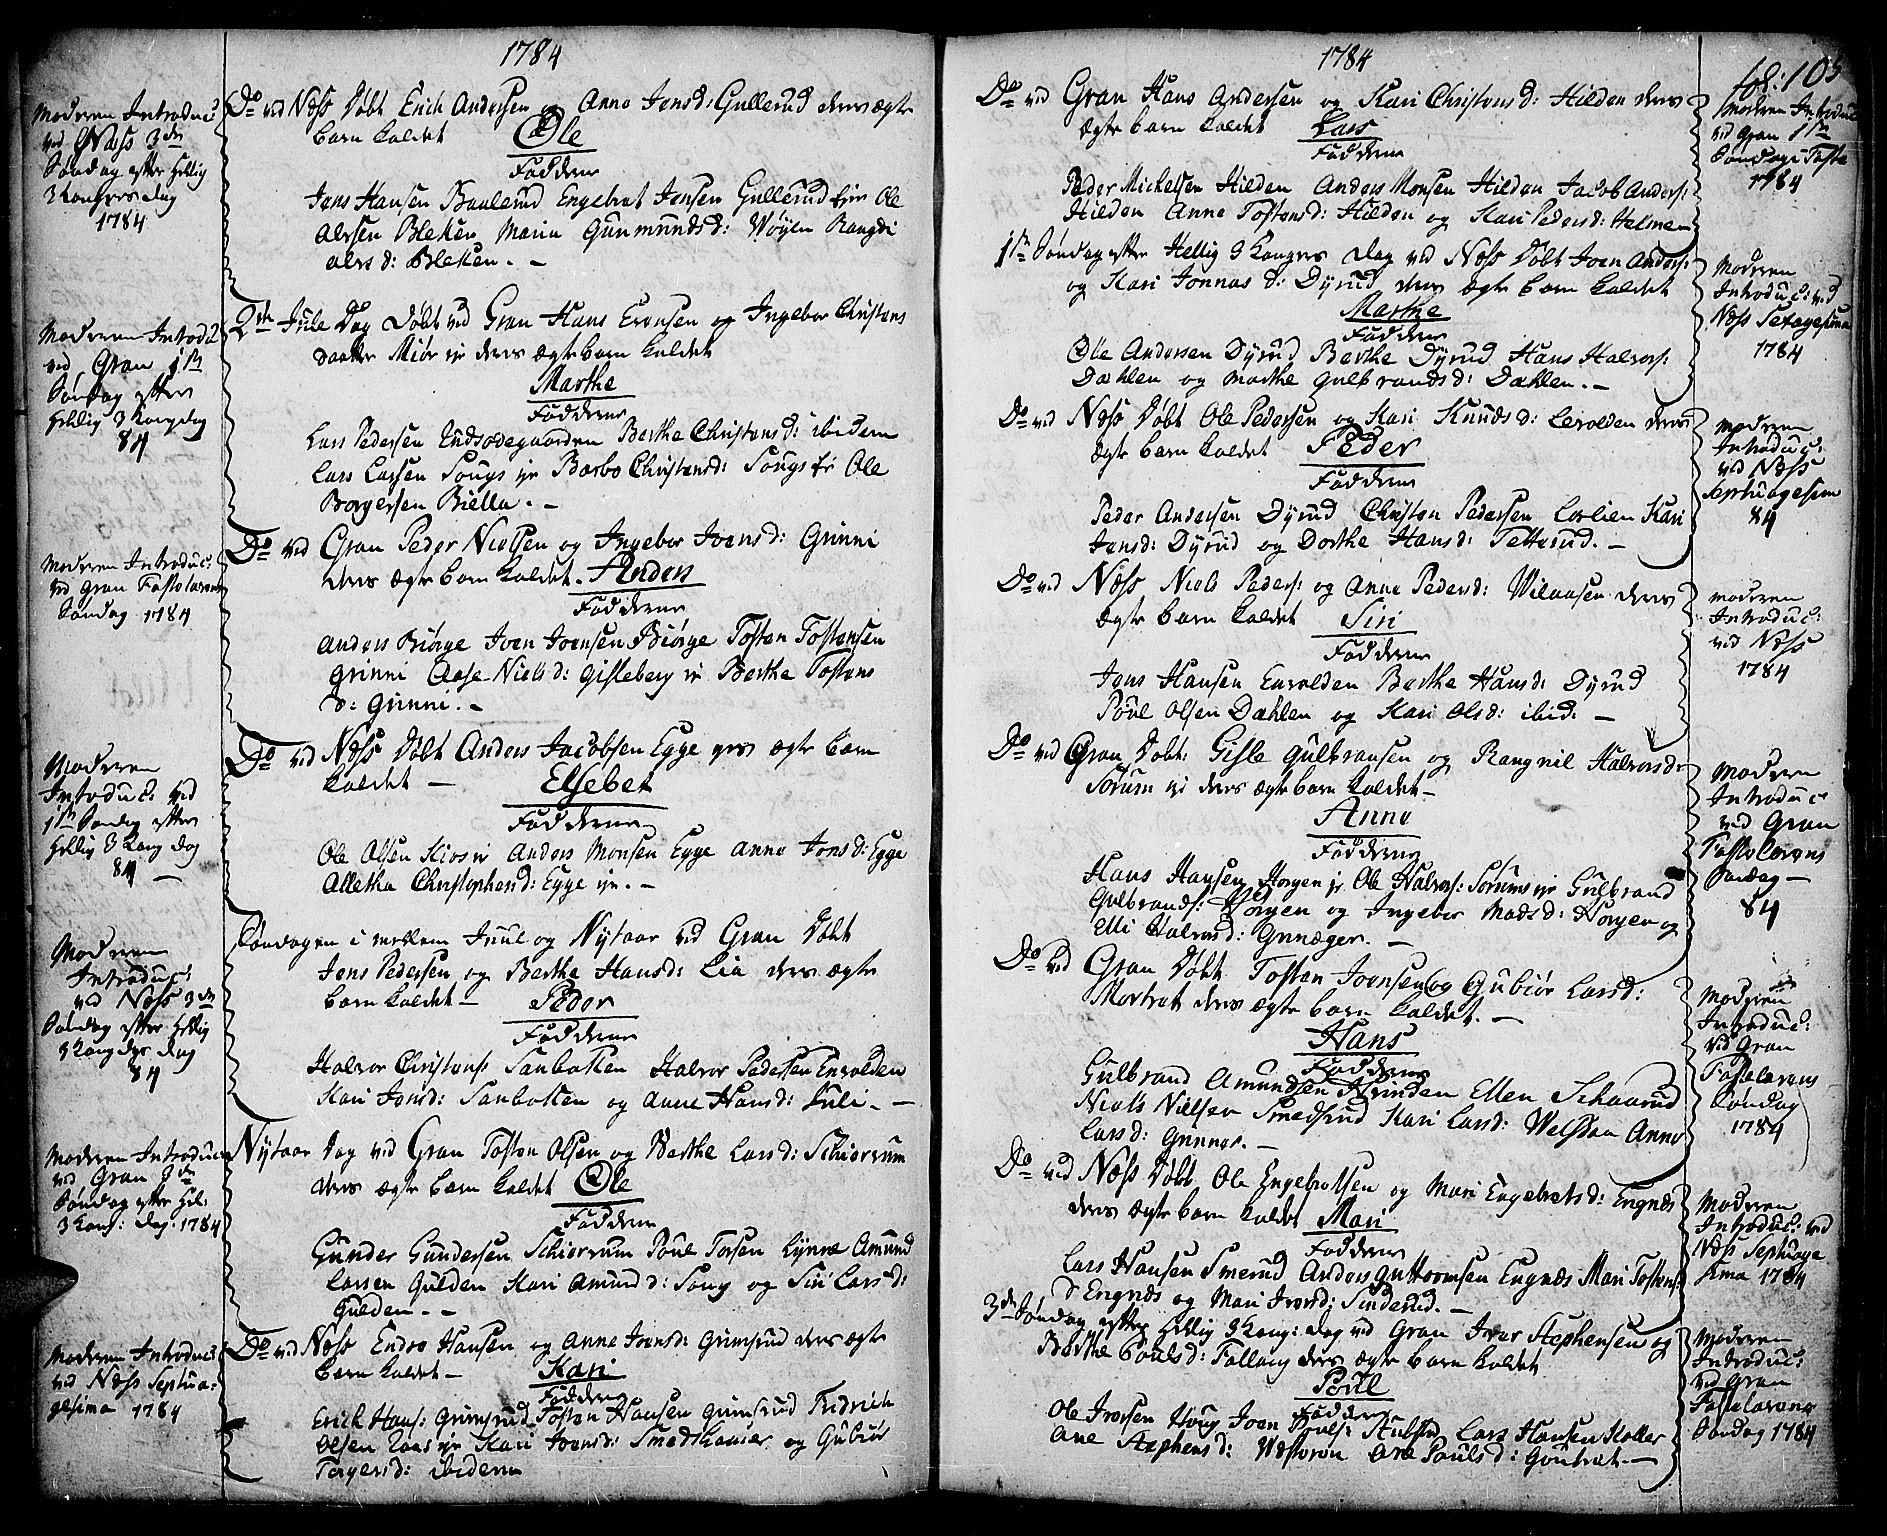 SAH, Gran prestekontor, Ministerialbok nr. 5, 1776-1788, s. 105